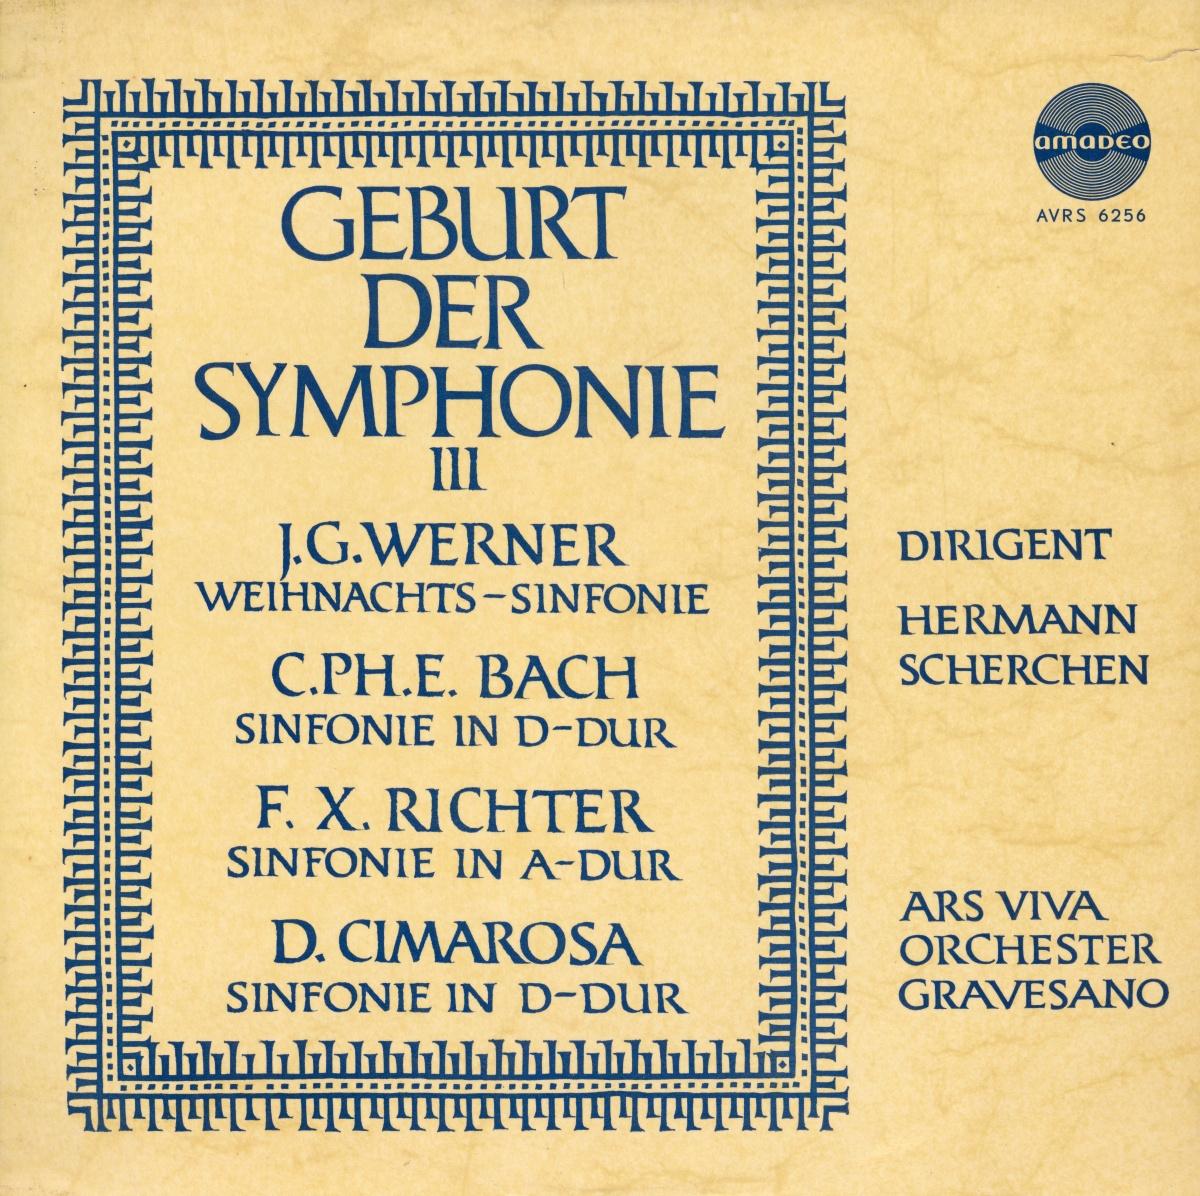 Recto de la pochette du disque Amadeo AVRS 6256, 3e volume de «Geburt der Symphonie»